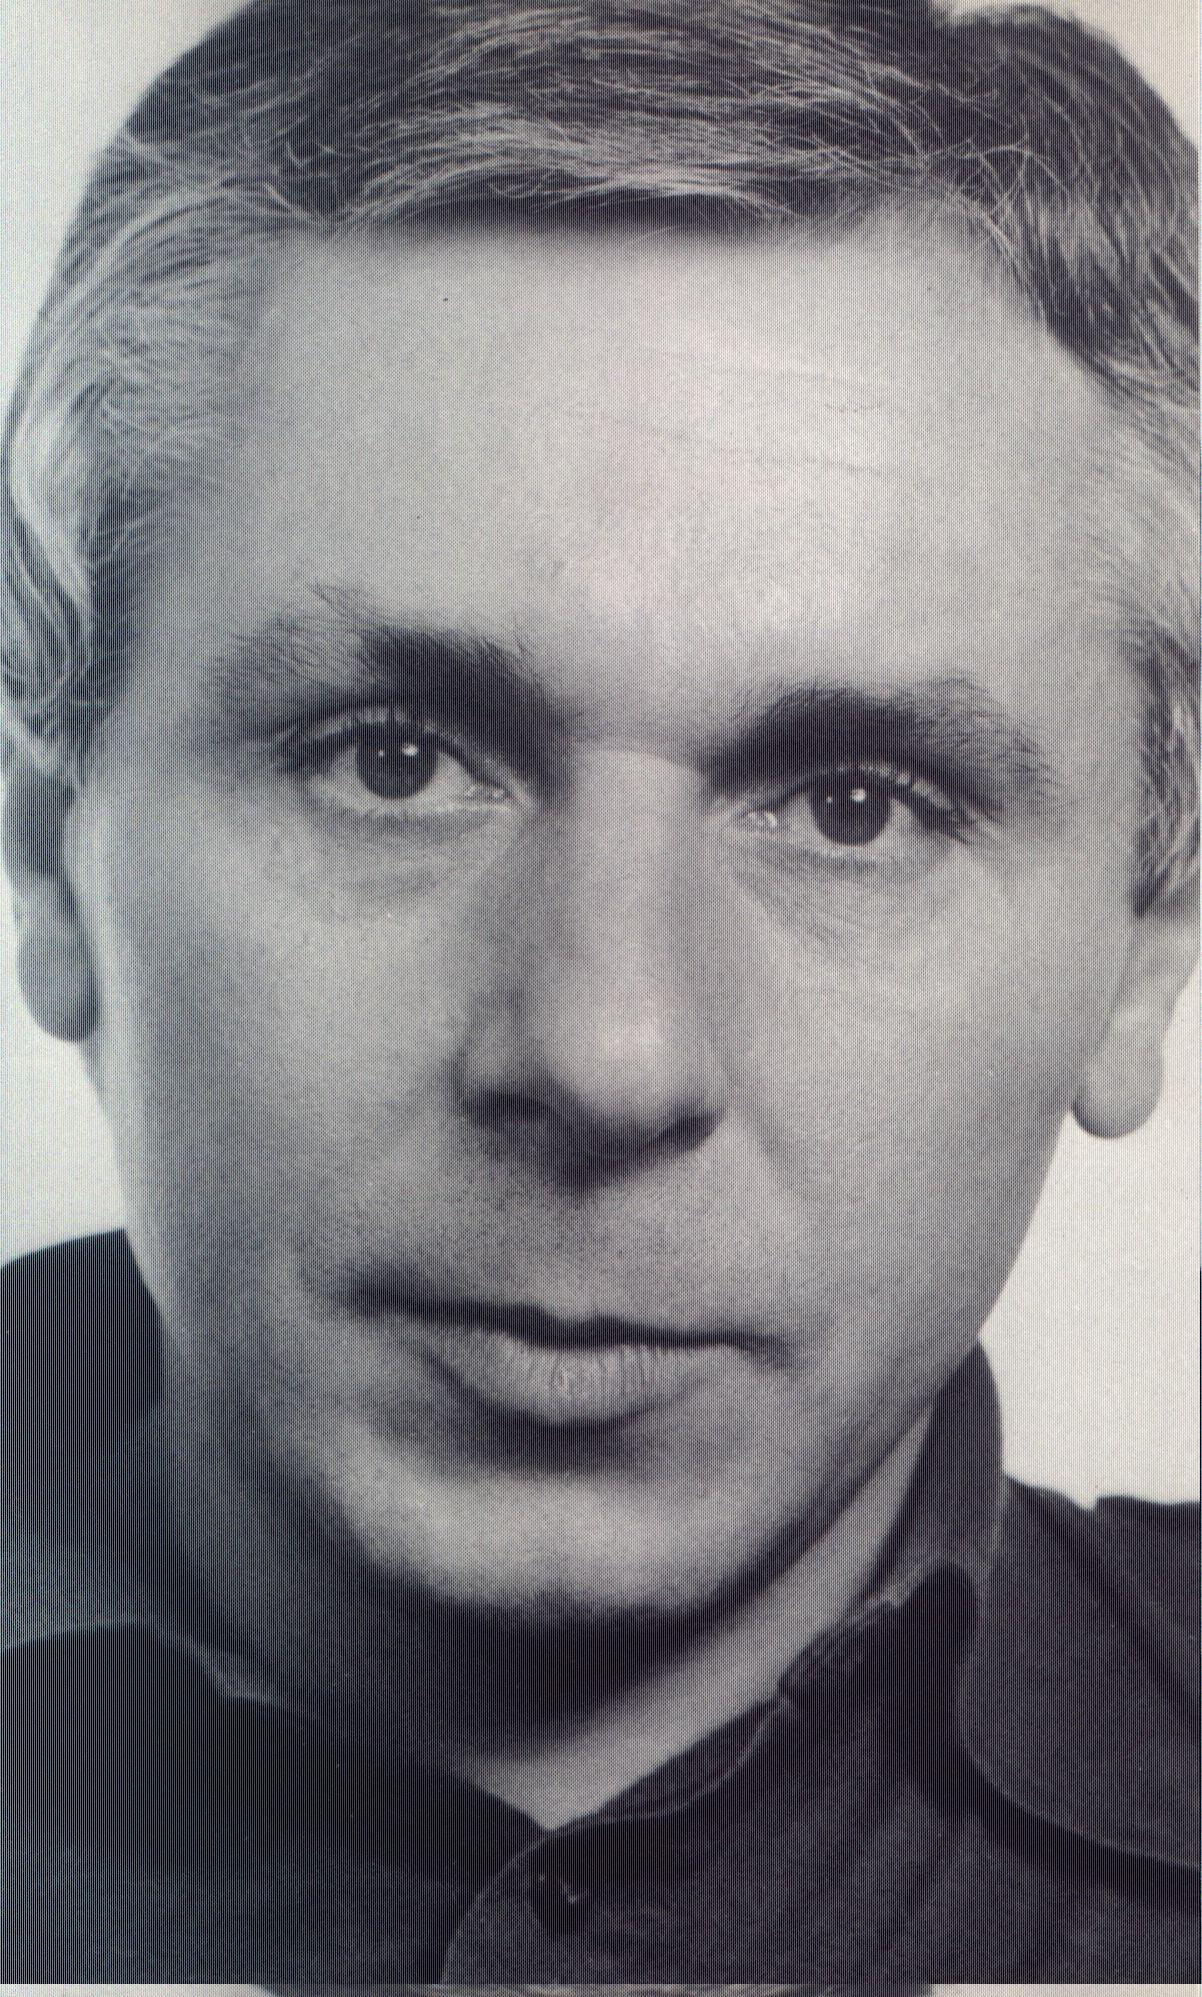 Kutasi Gyula portréja